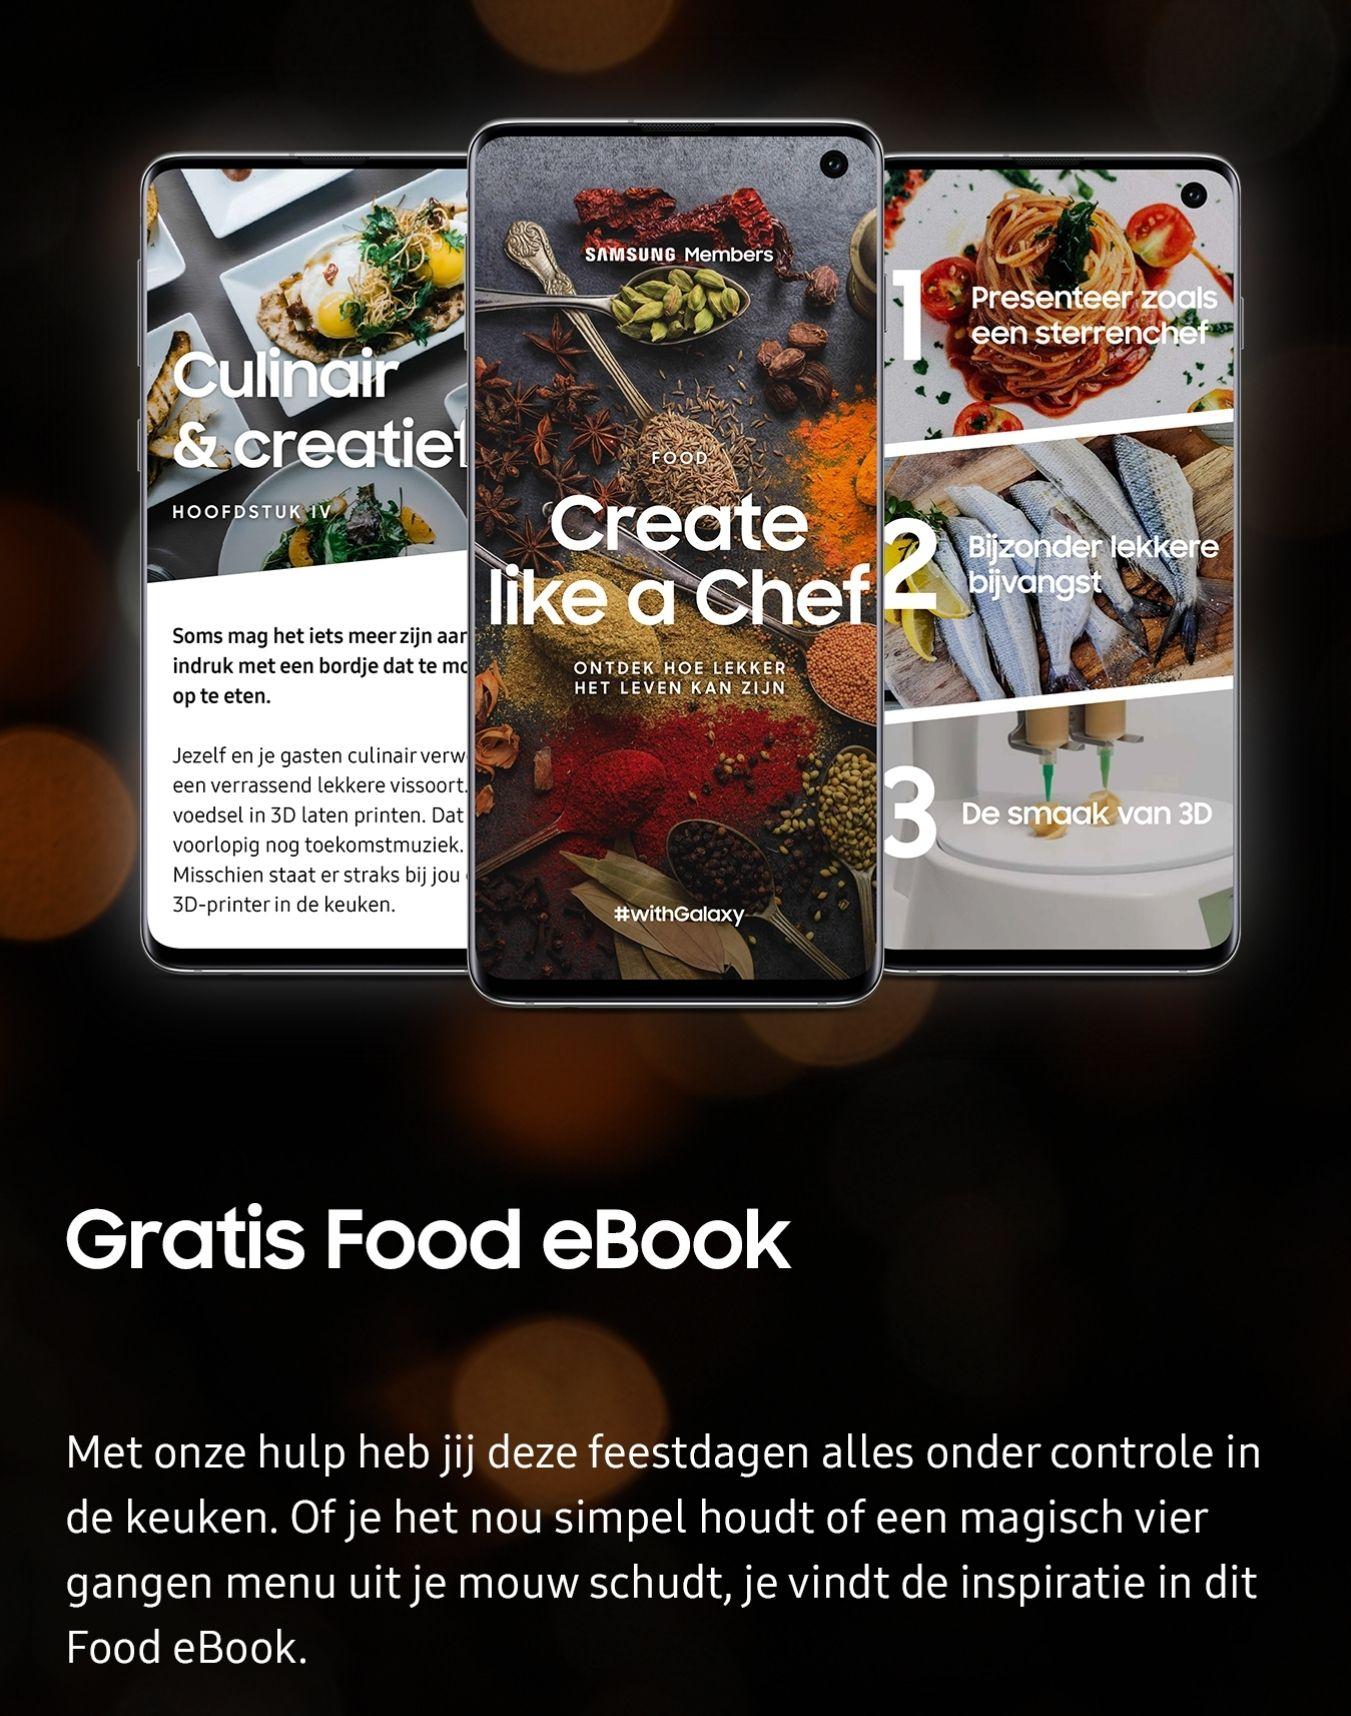 [Samsung members] Feestfood fotograferen? Download gratis food & fotografie ebook